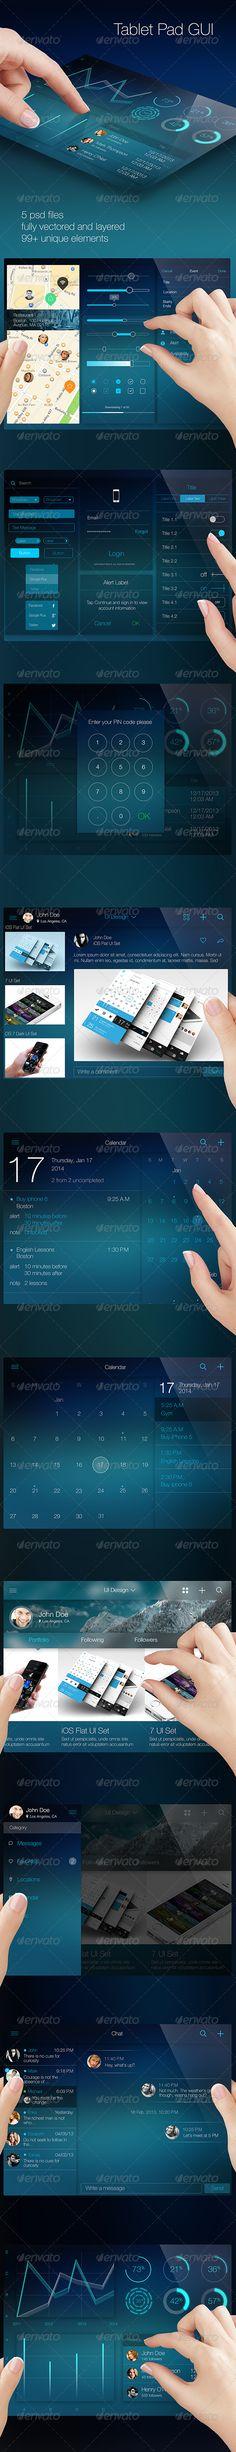 iOS Tablet Flat Pad UI Set Vol. 2 - User Interfaces Web Elements